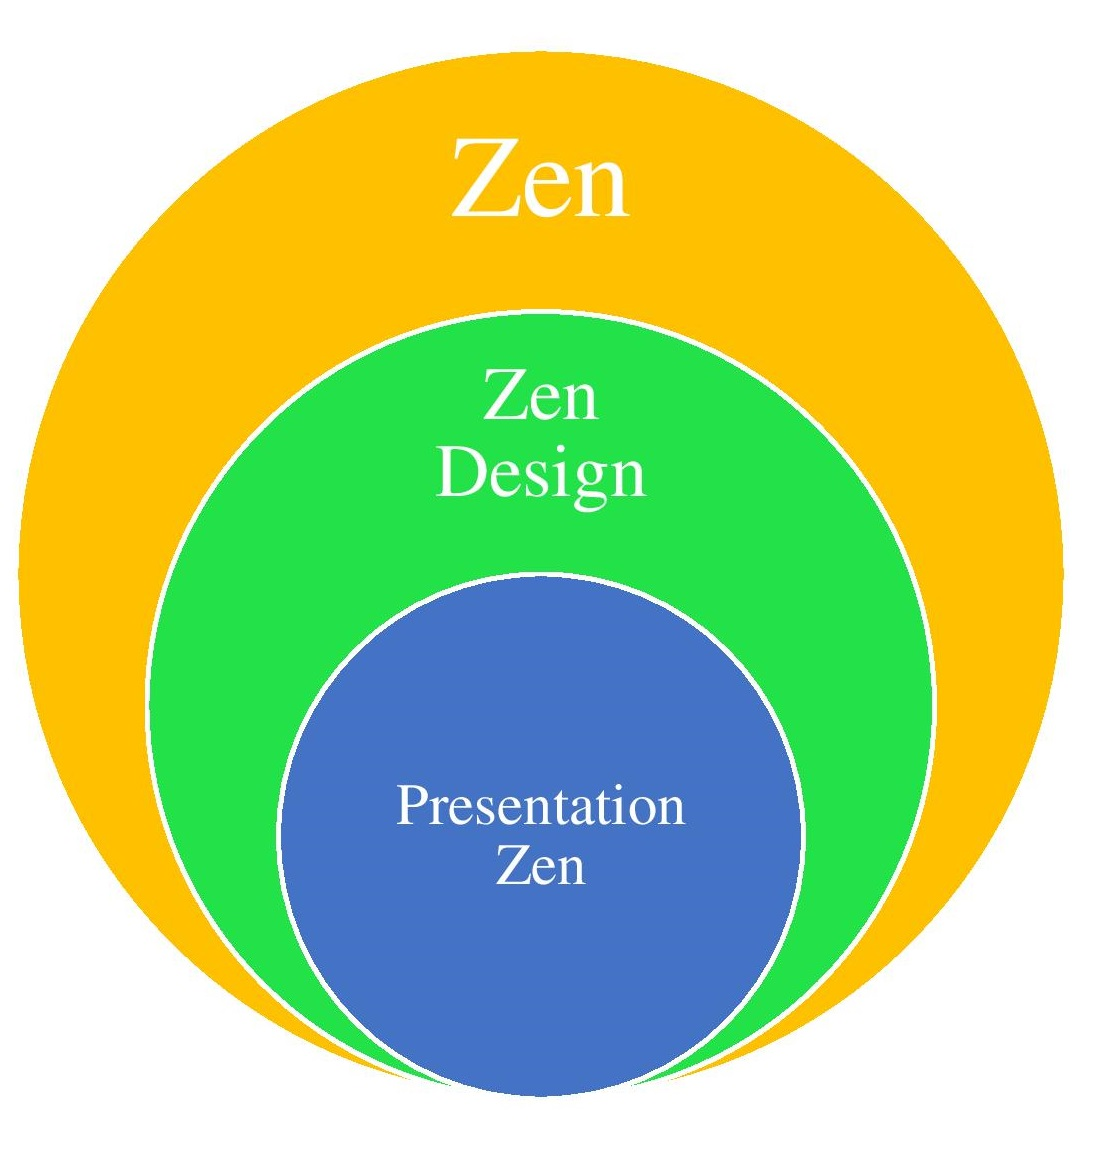 Zen Design Exercise